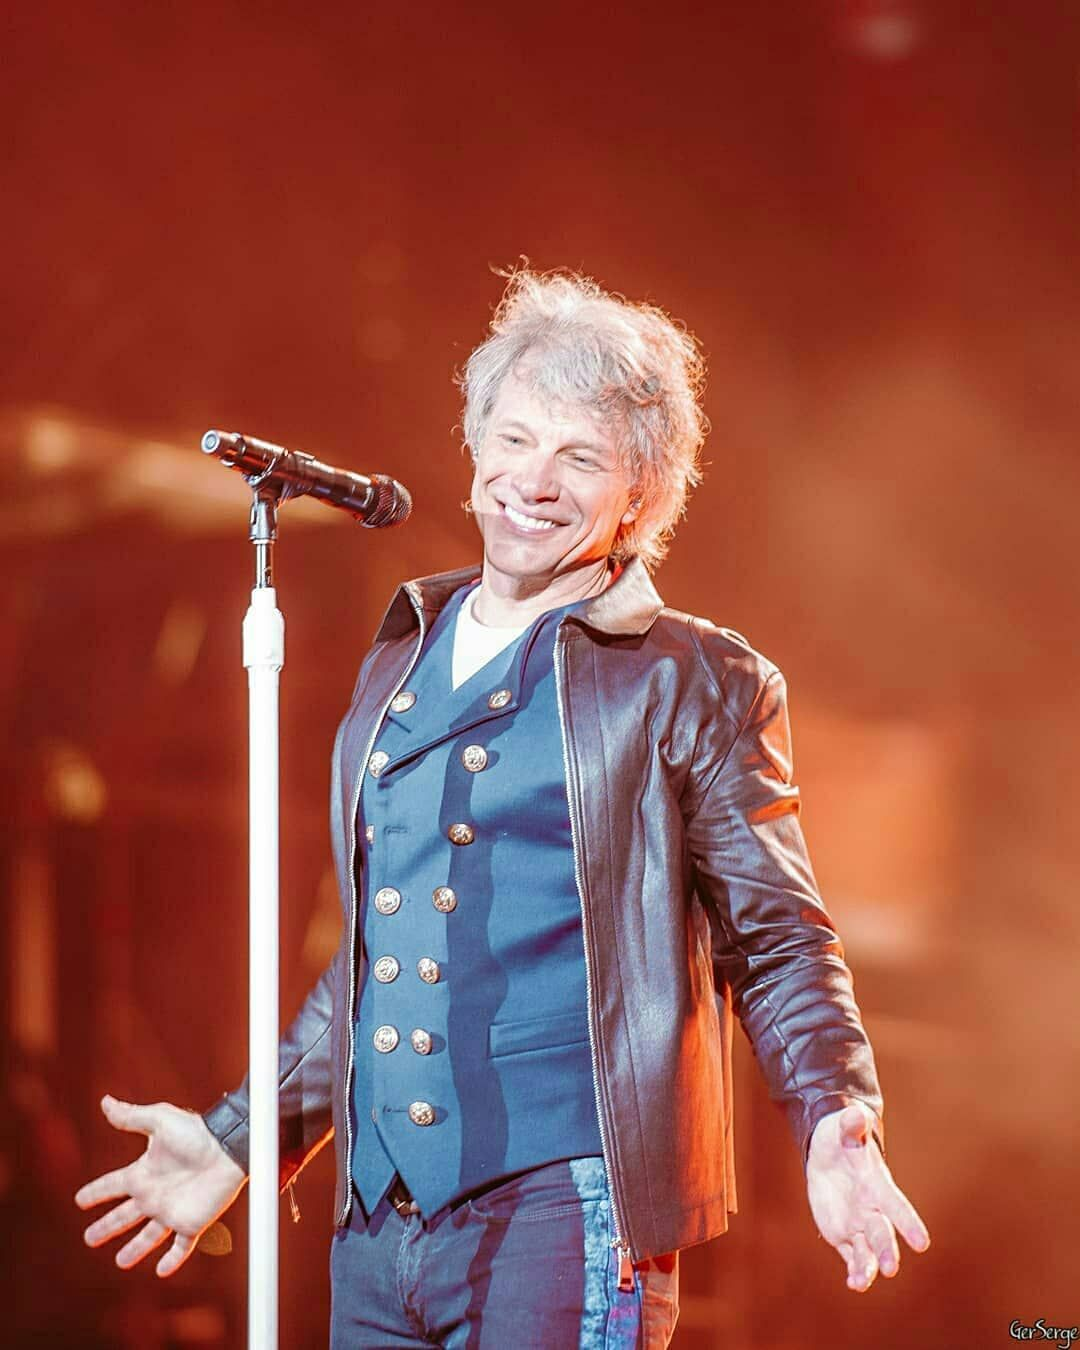 Repost From Gerserge Concert For The First Time In 30 Years In Russia Bonjovi Bonjoviforever Bondzhovi Koncert Jon Bon Jovi Bon Jovi Pictures Bon Jovi